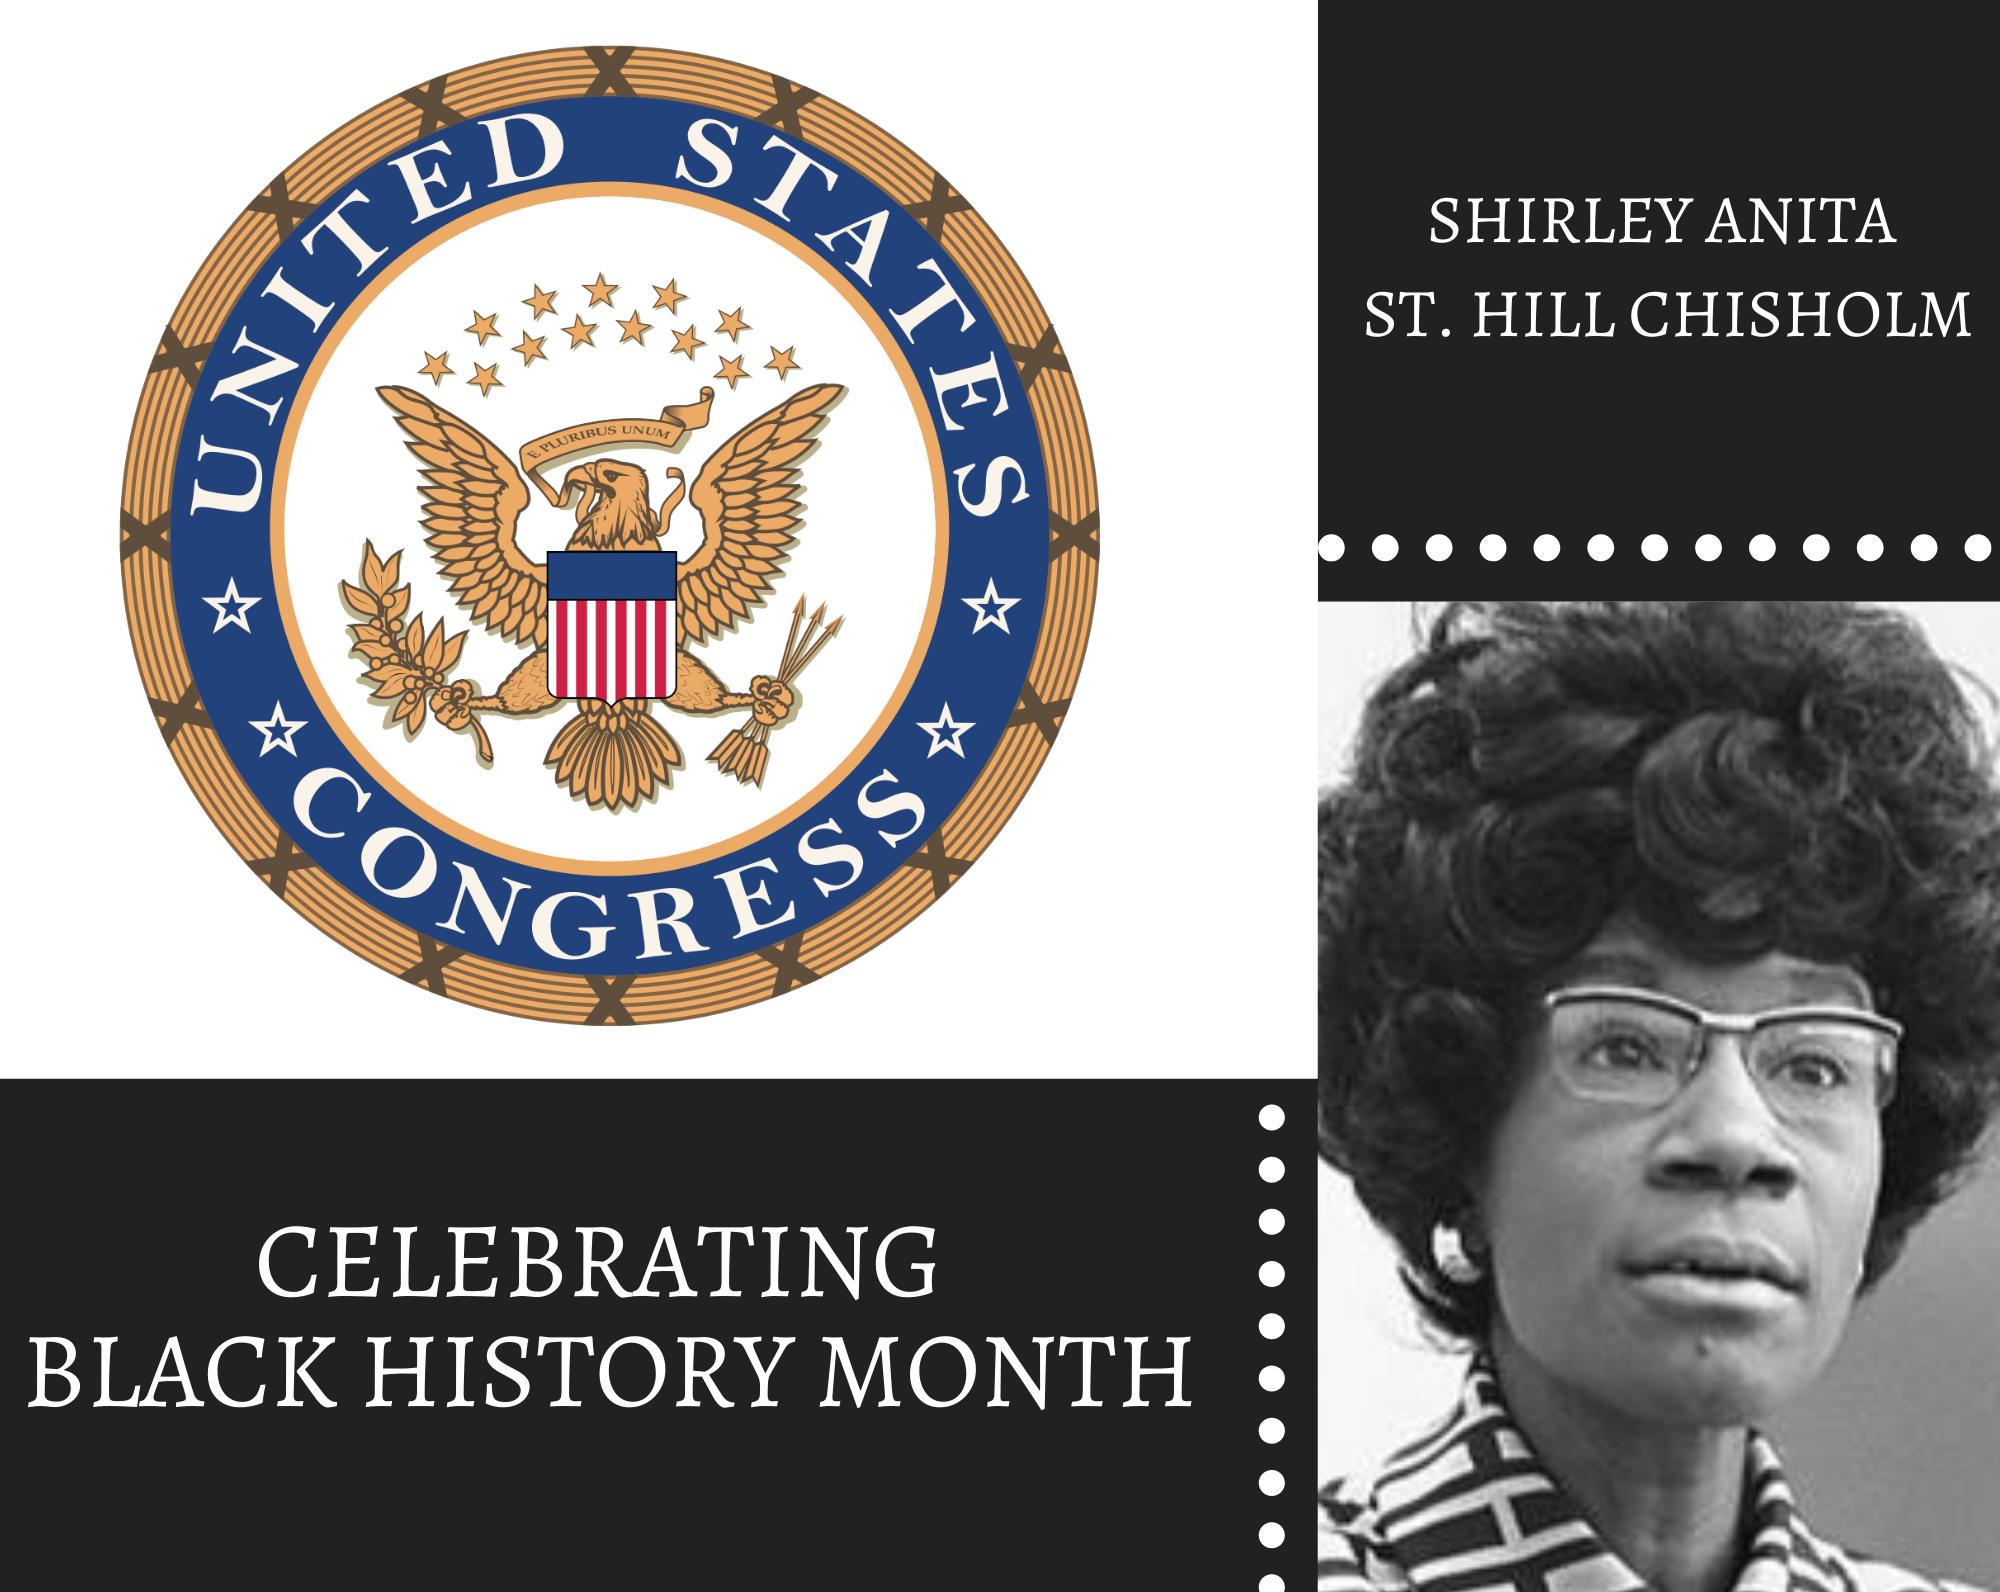 Christian Academy School System | Celebrating Black History Month | Shirley Anita St. Hill Chisholm